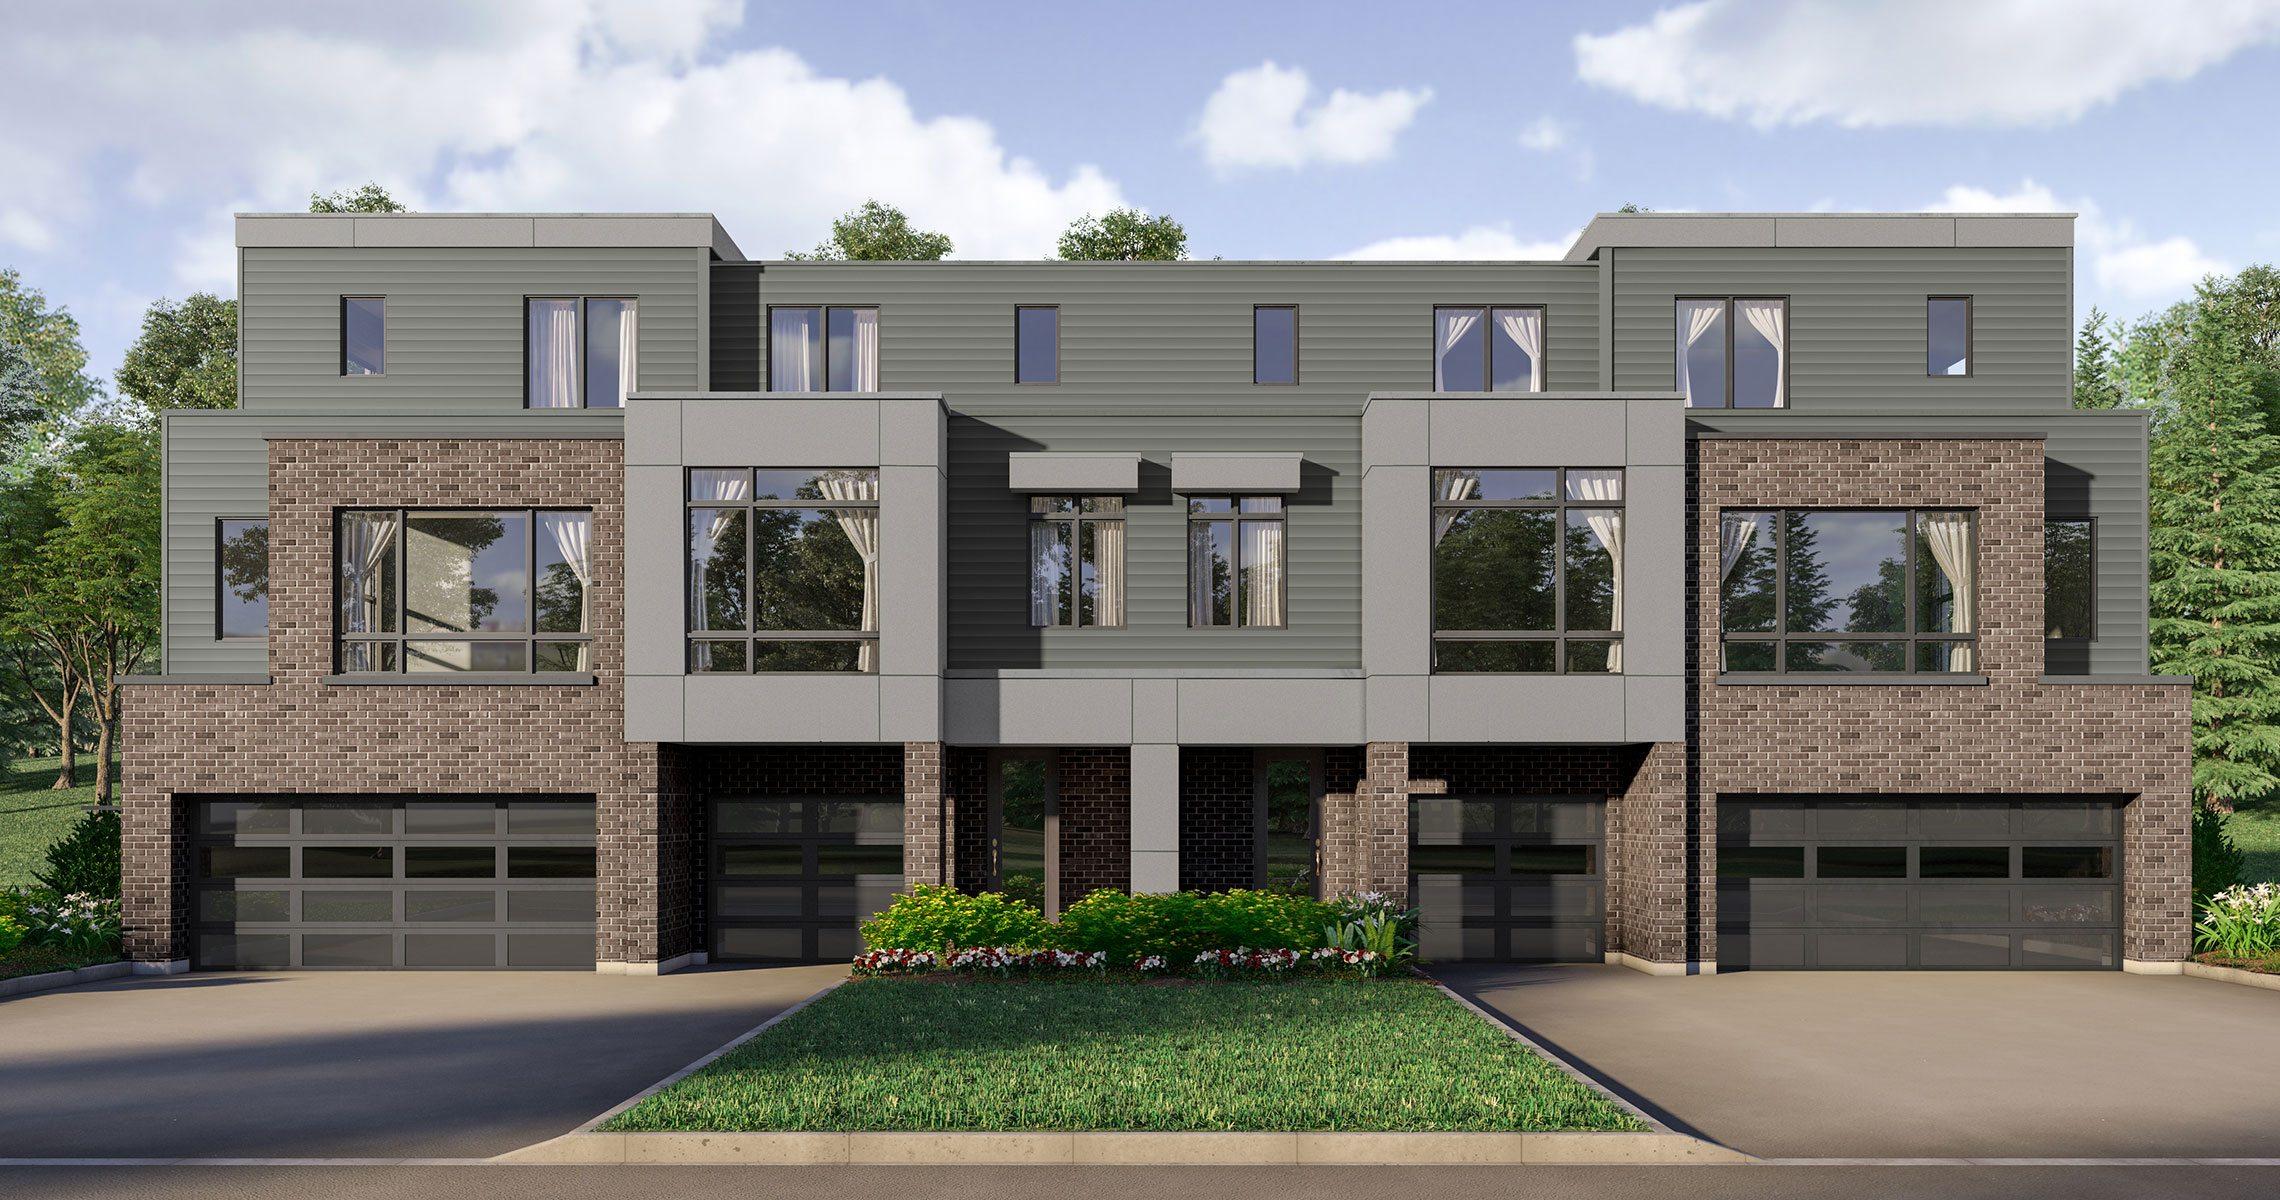 Oak Bay Condos Property View Toronto, Canada